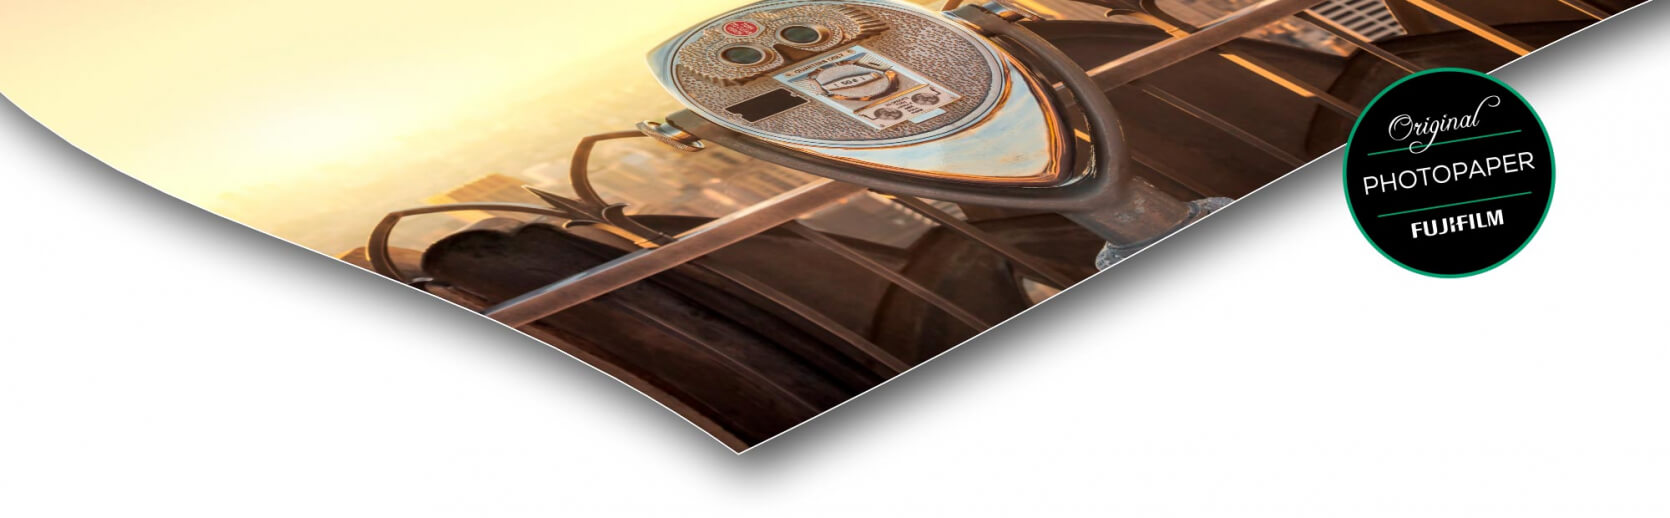 fotopapier foto op hout mat